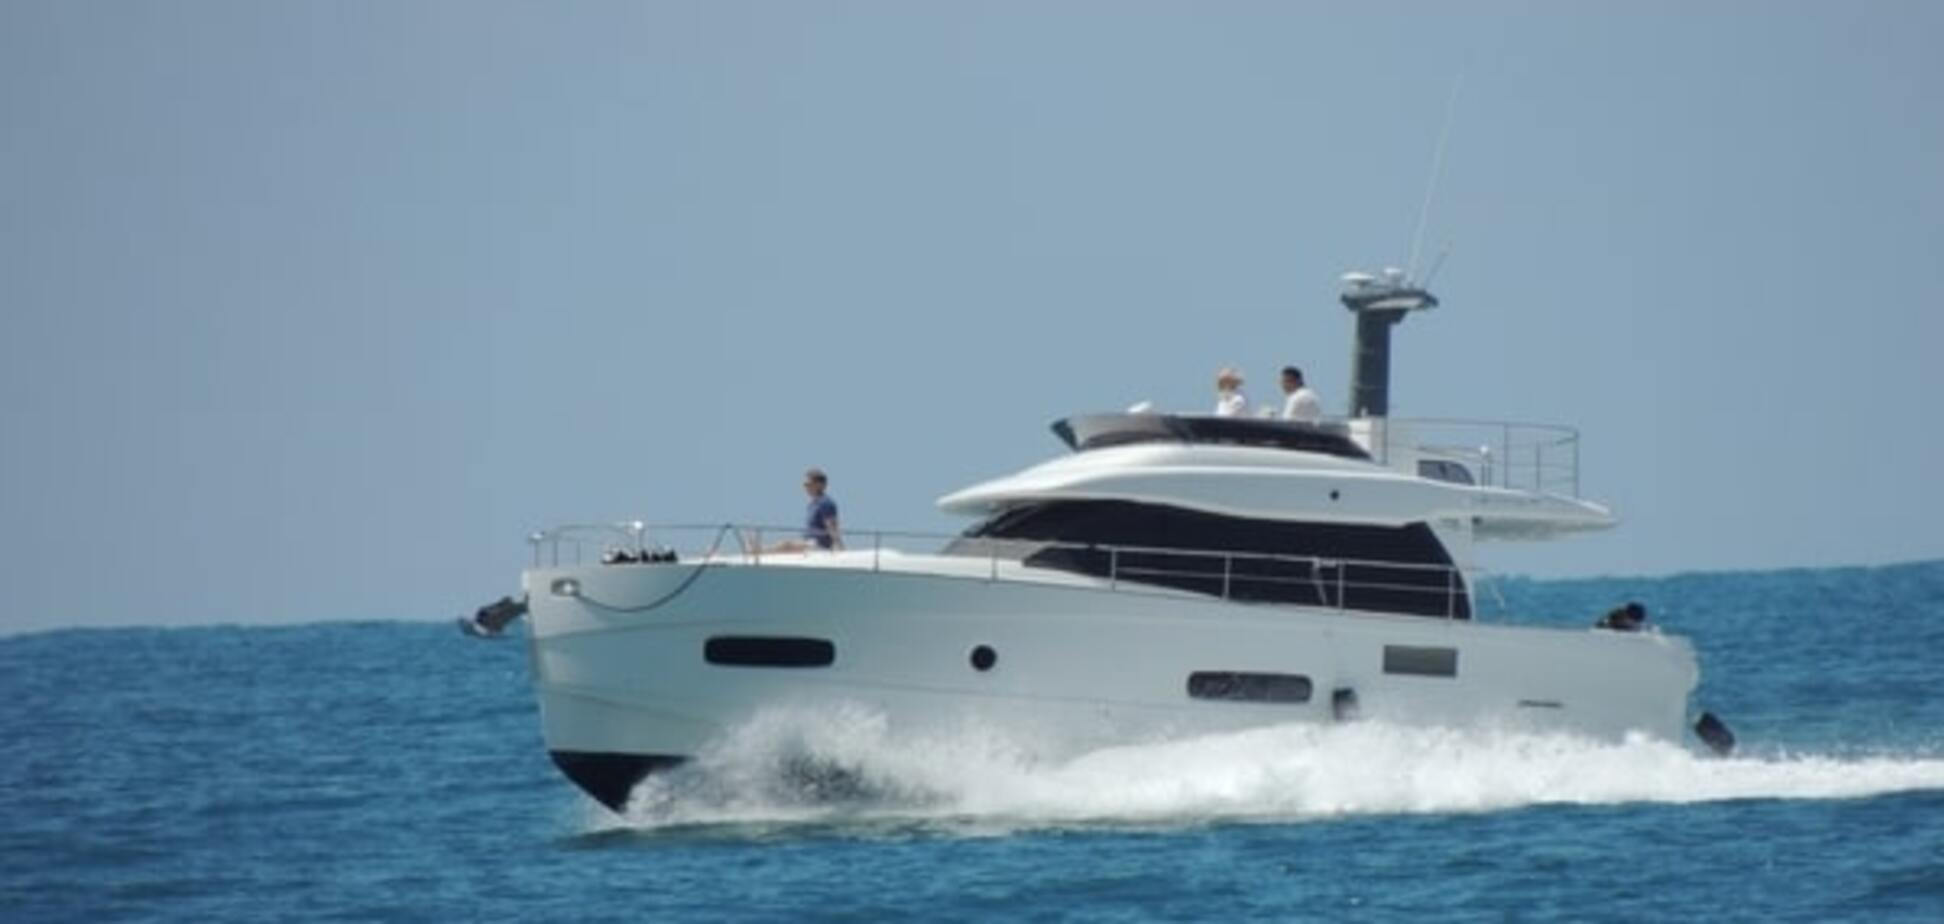 'Патриарха Кирилла' засекли на яхте за полмиллиона евро в одних трусах: опубликованы фото